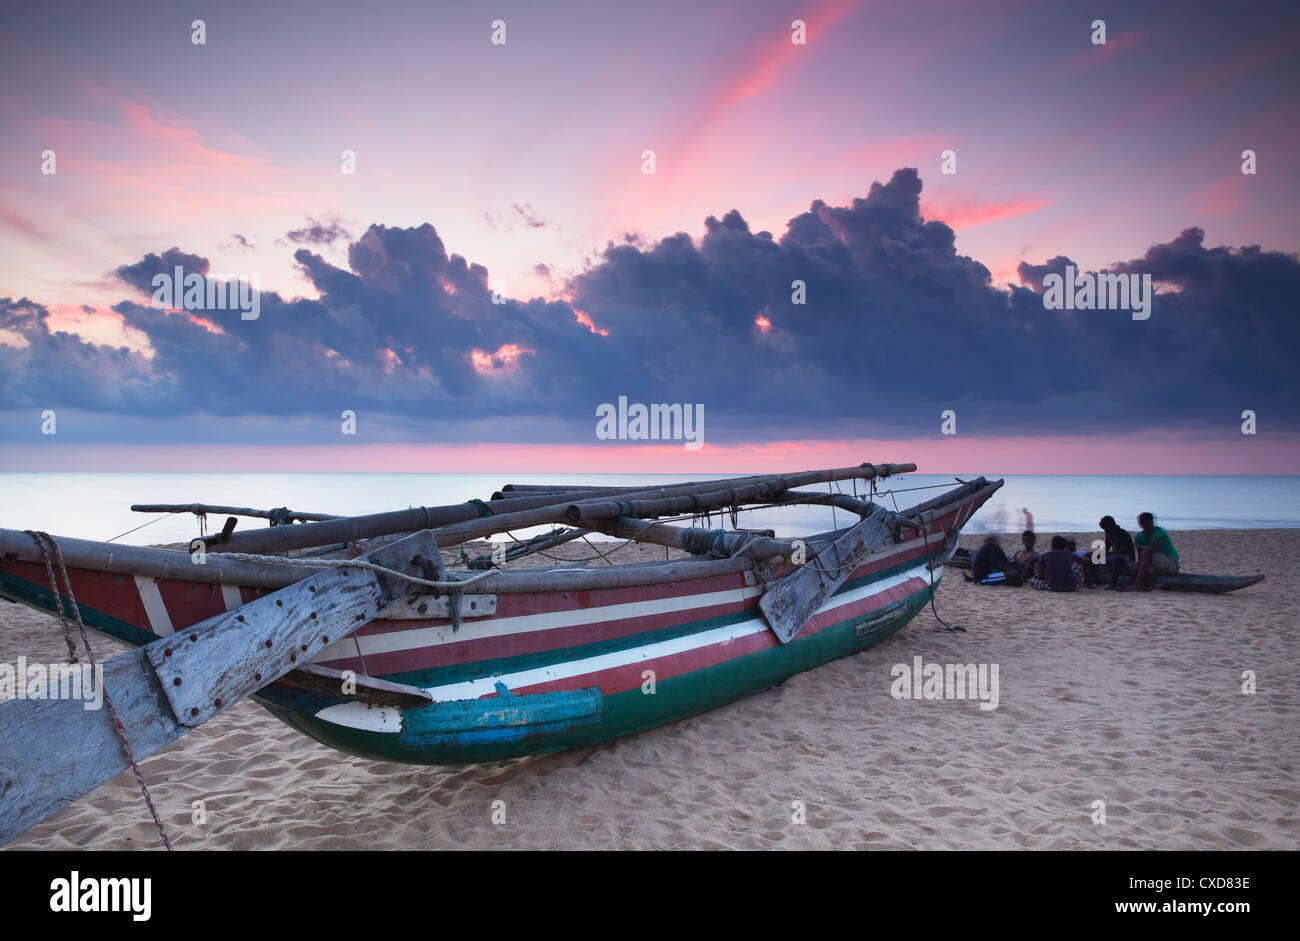 Oruwa (outrigger canoe) on beach at sunset, Negombo, North Western Province, Sri Lanka, Asia Stock Photo